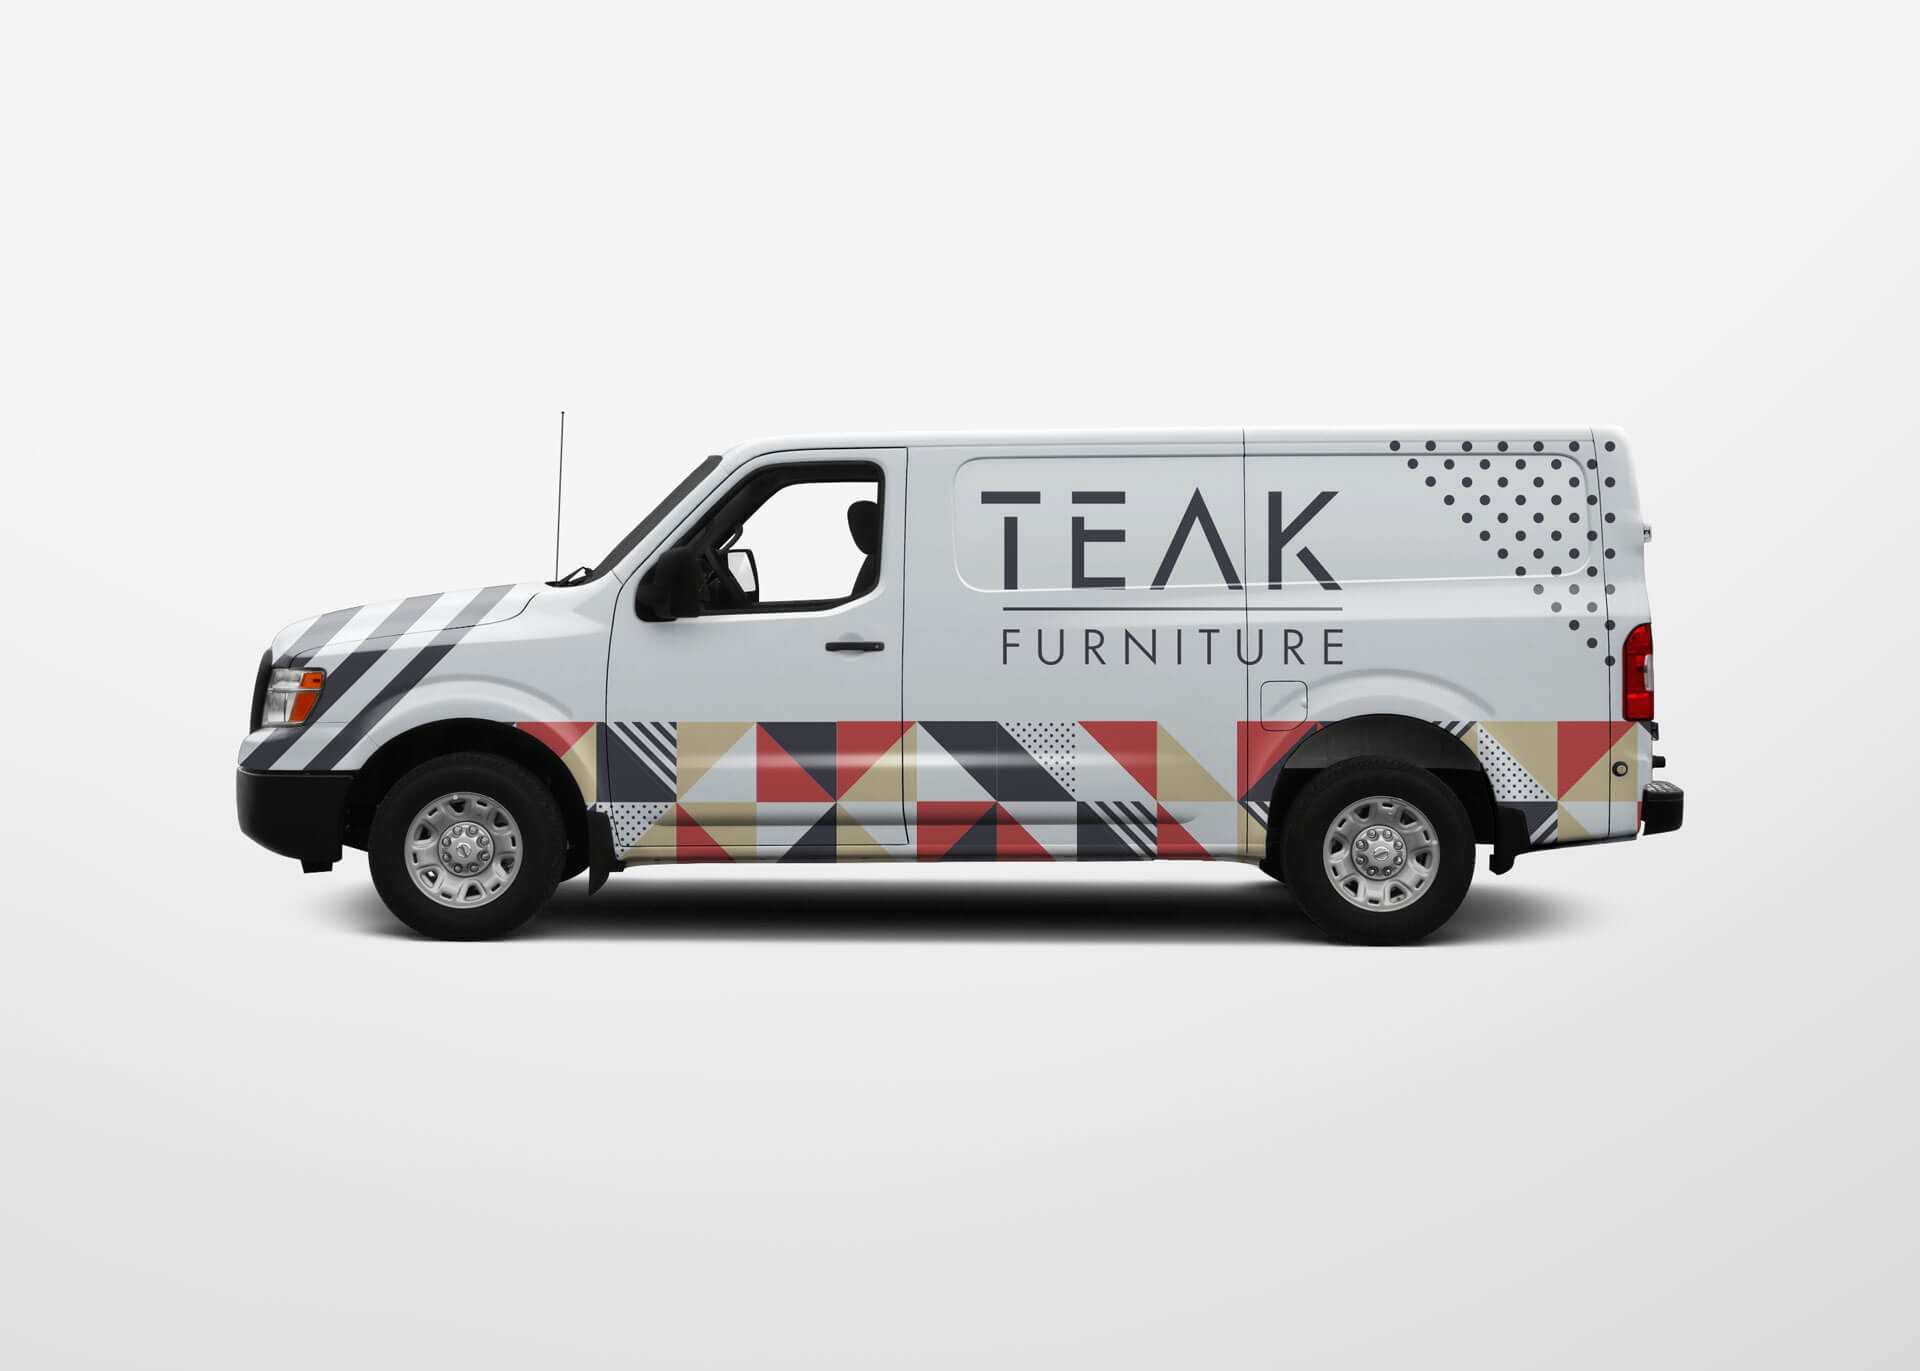 Teak furniture delivery van with branding wrap